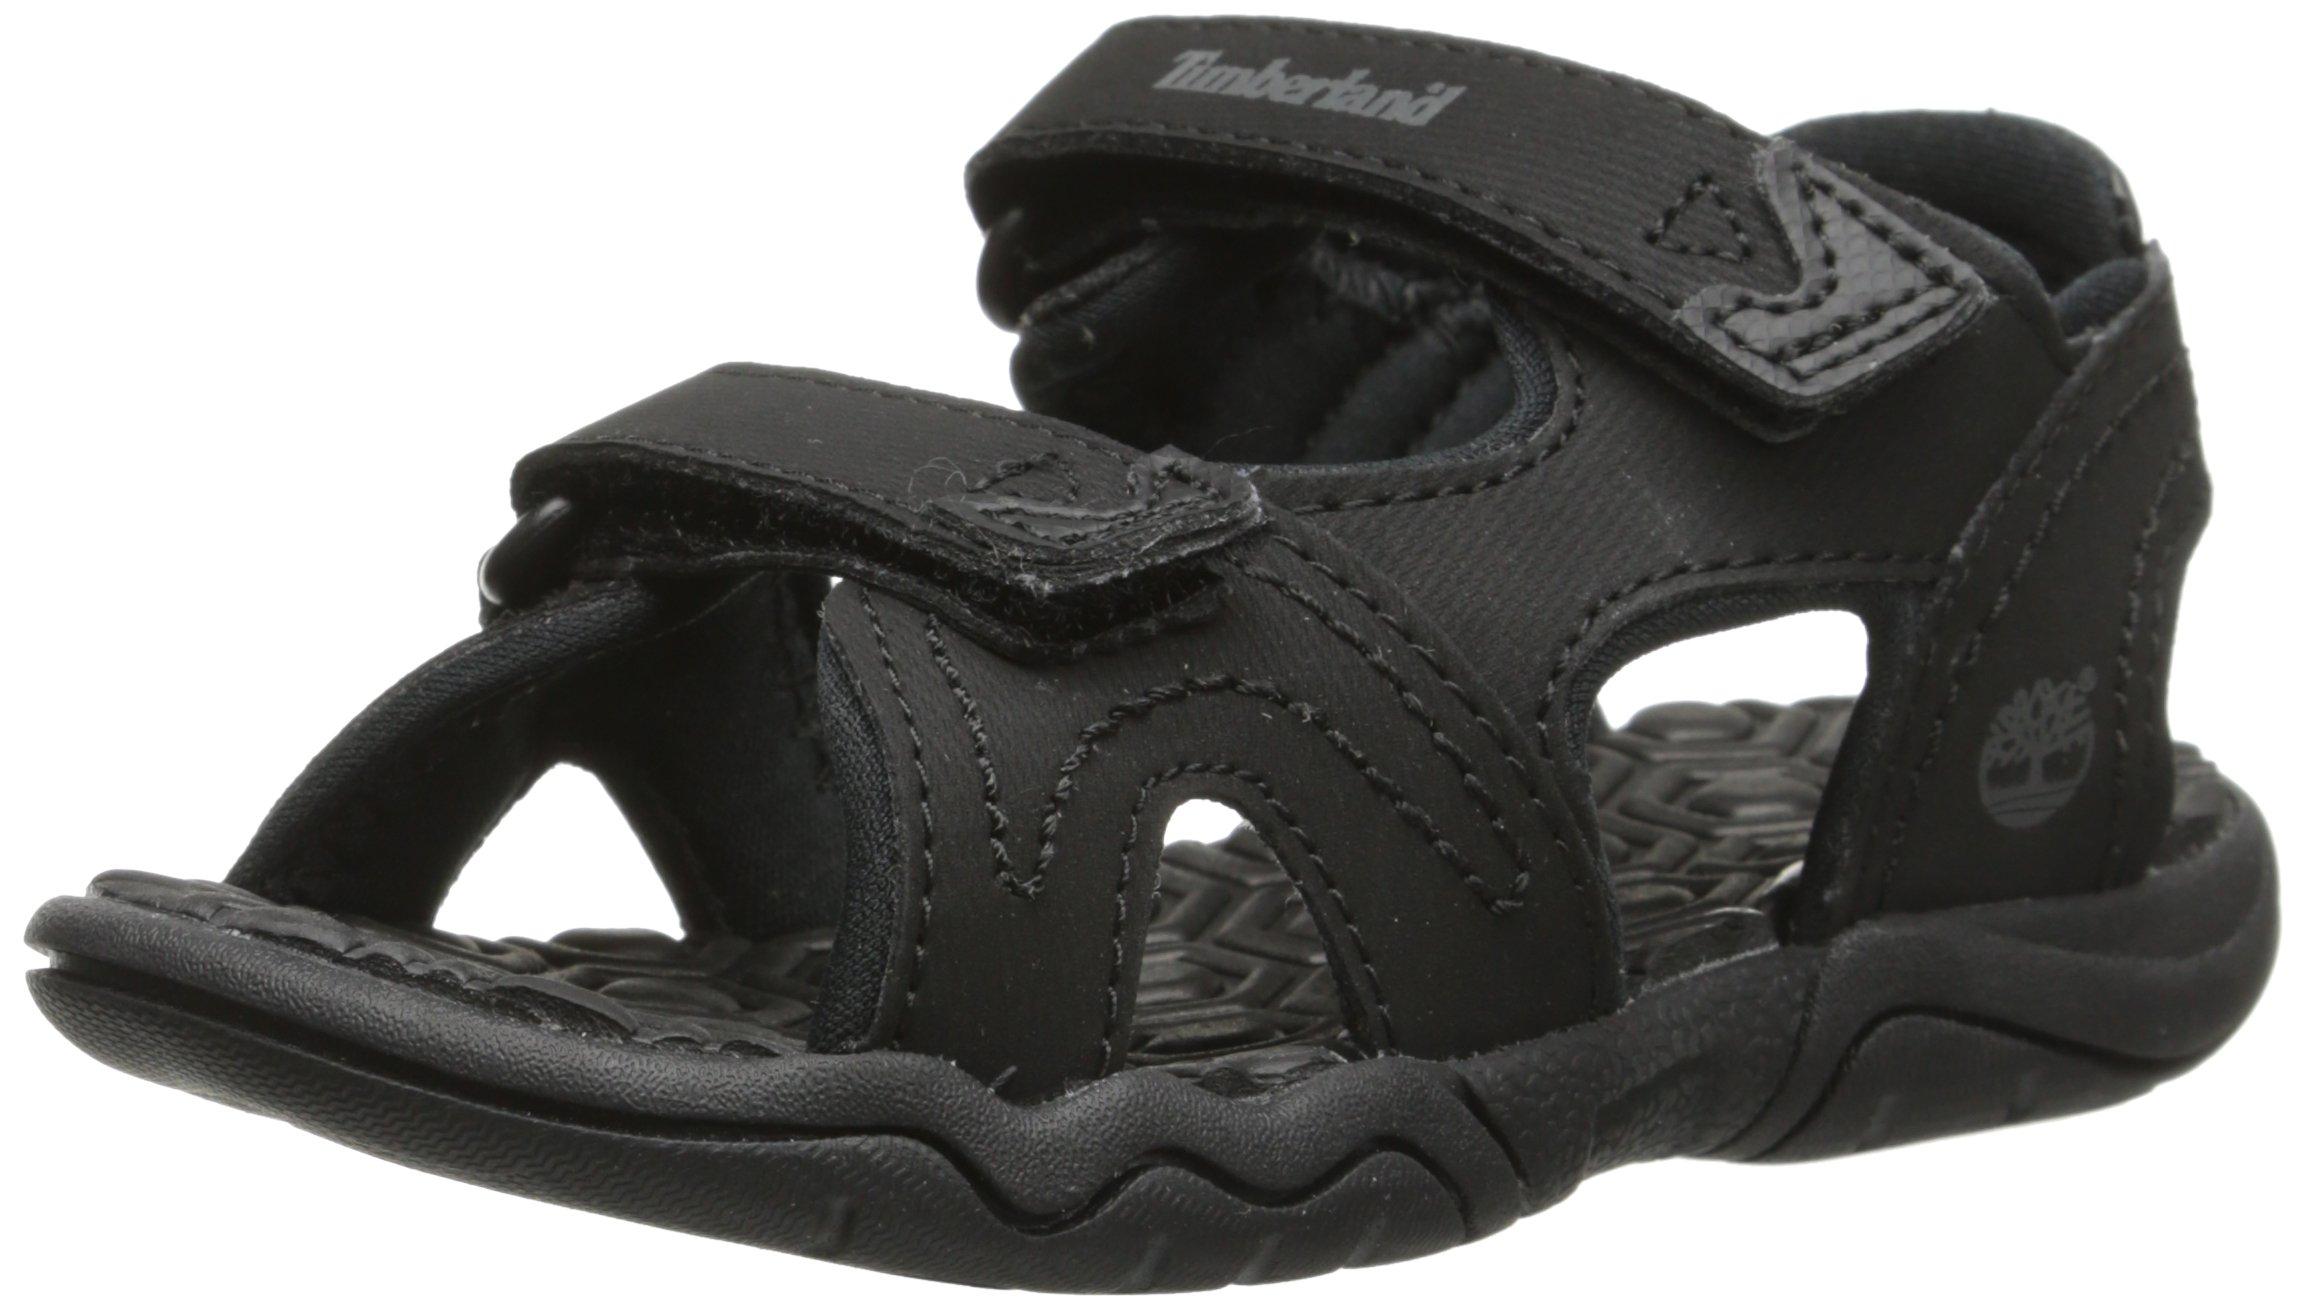 Timberland Adventure Seeker Two-Strap Sandal (Toddler/Little Kid),Blackout,9 M US Toddler